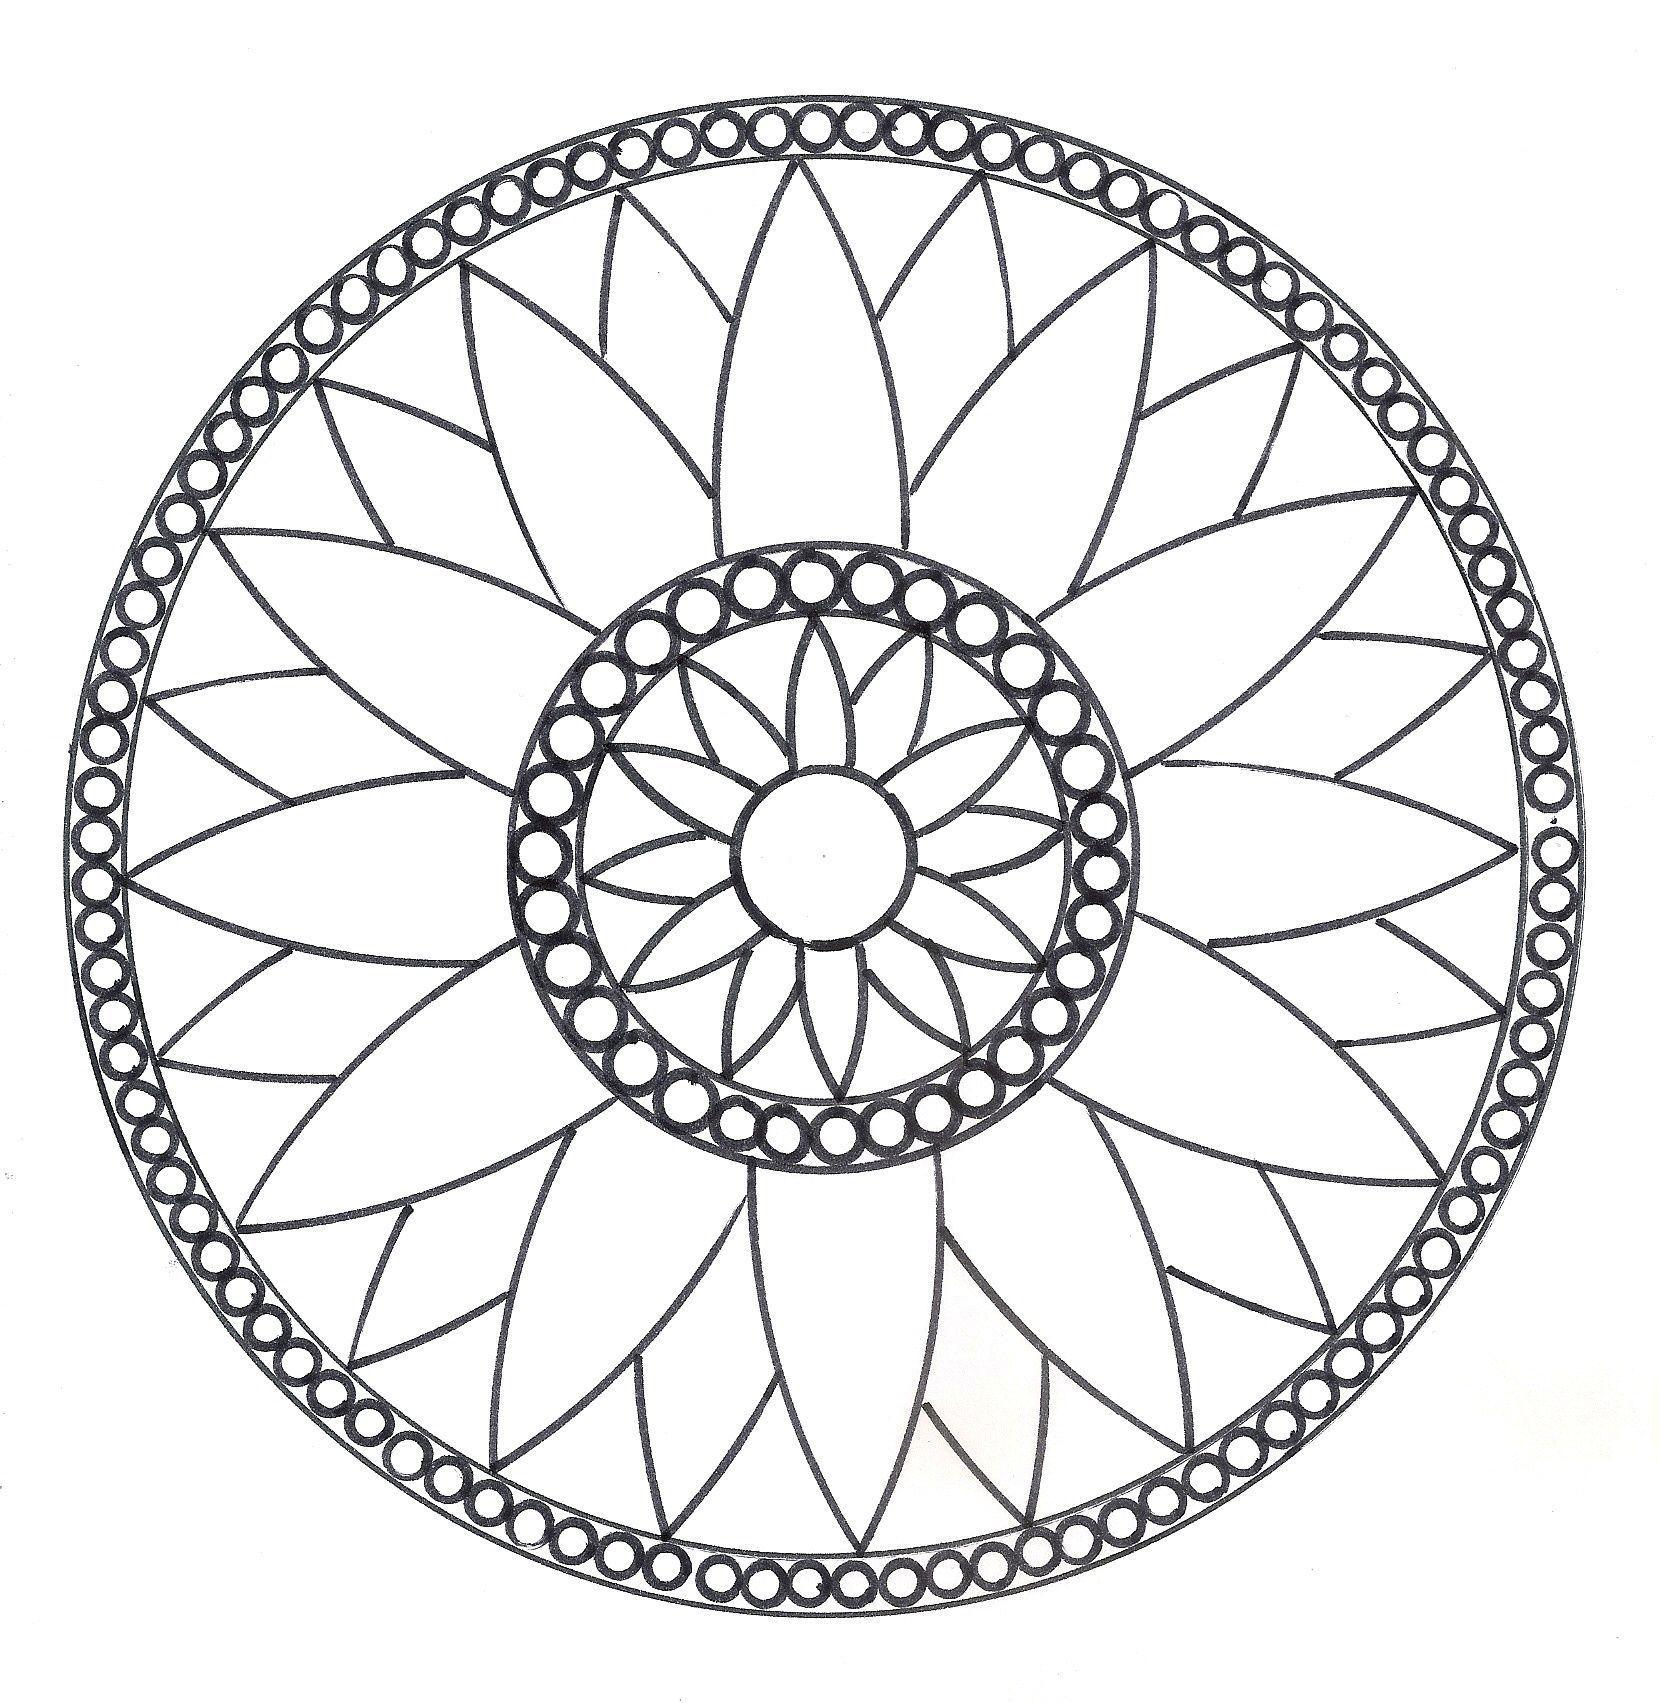 Mandalas - Rosace modèle n°1